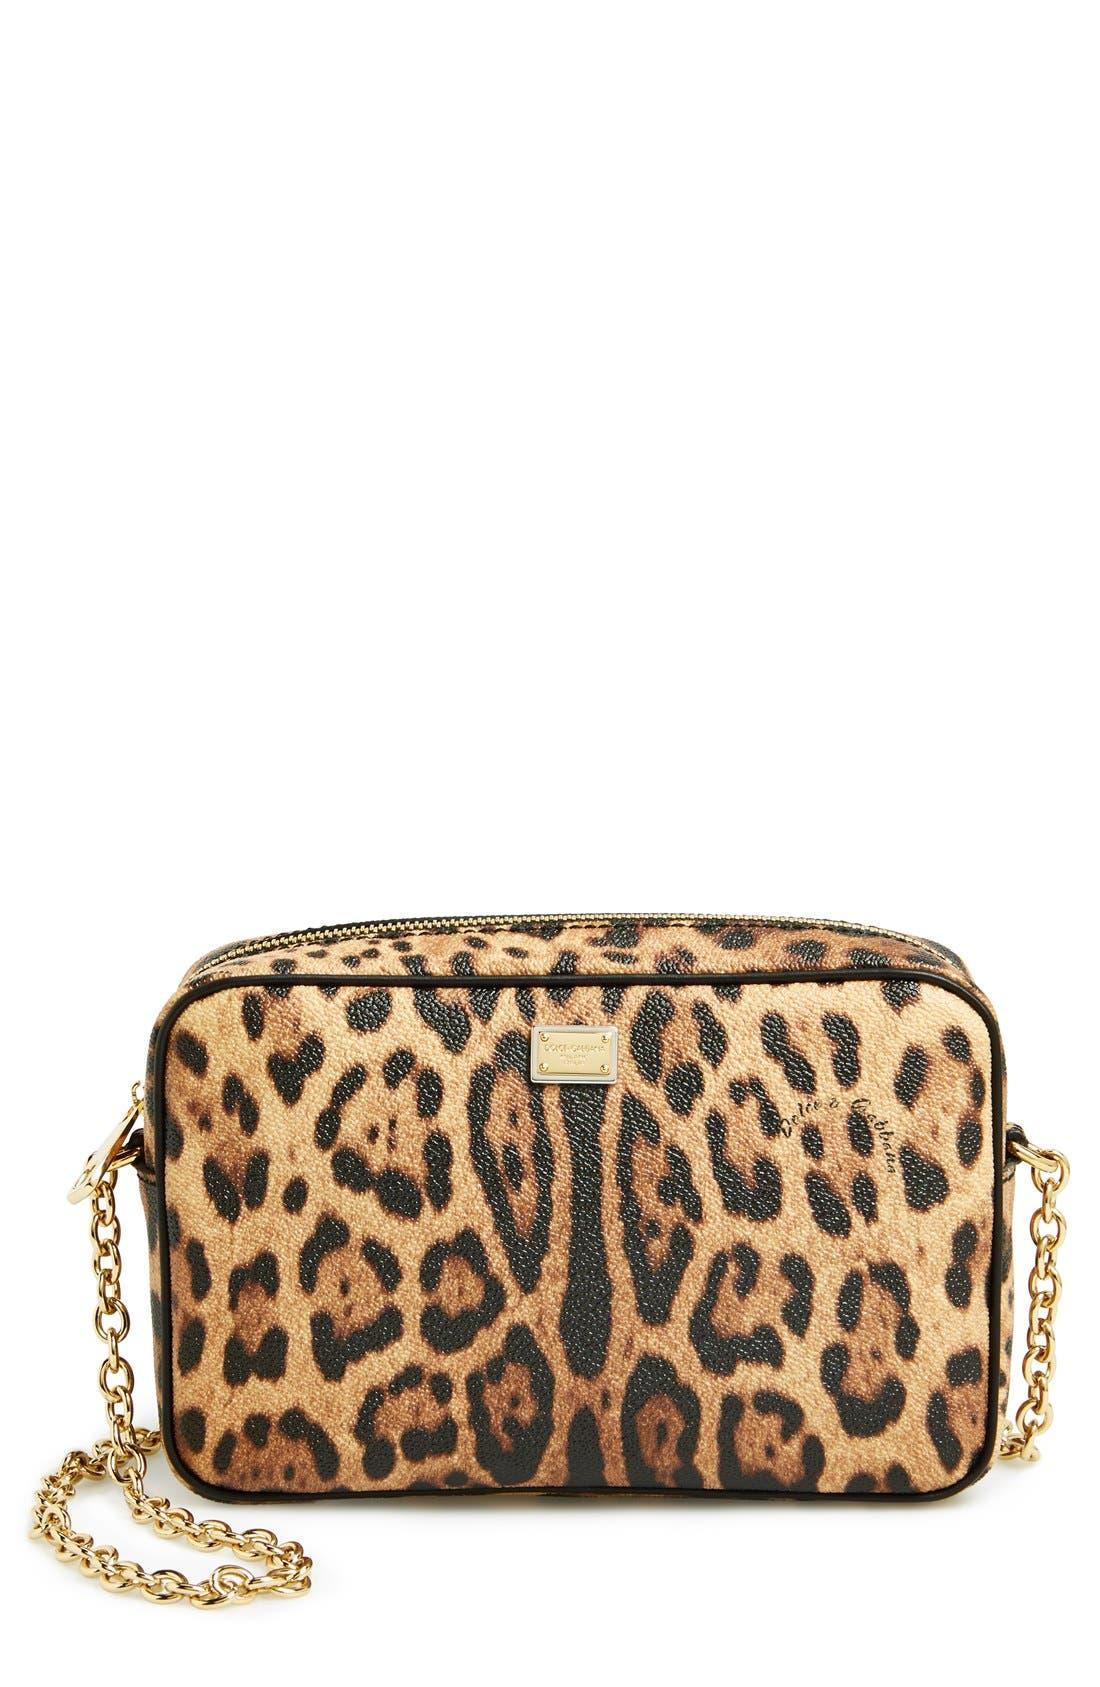 Alternate Image 1 Selected - Dolce&Gabbana 'Miss Cleo - Box' Crossbody Bag